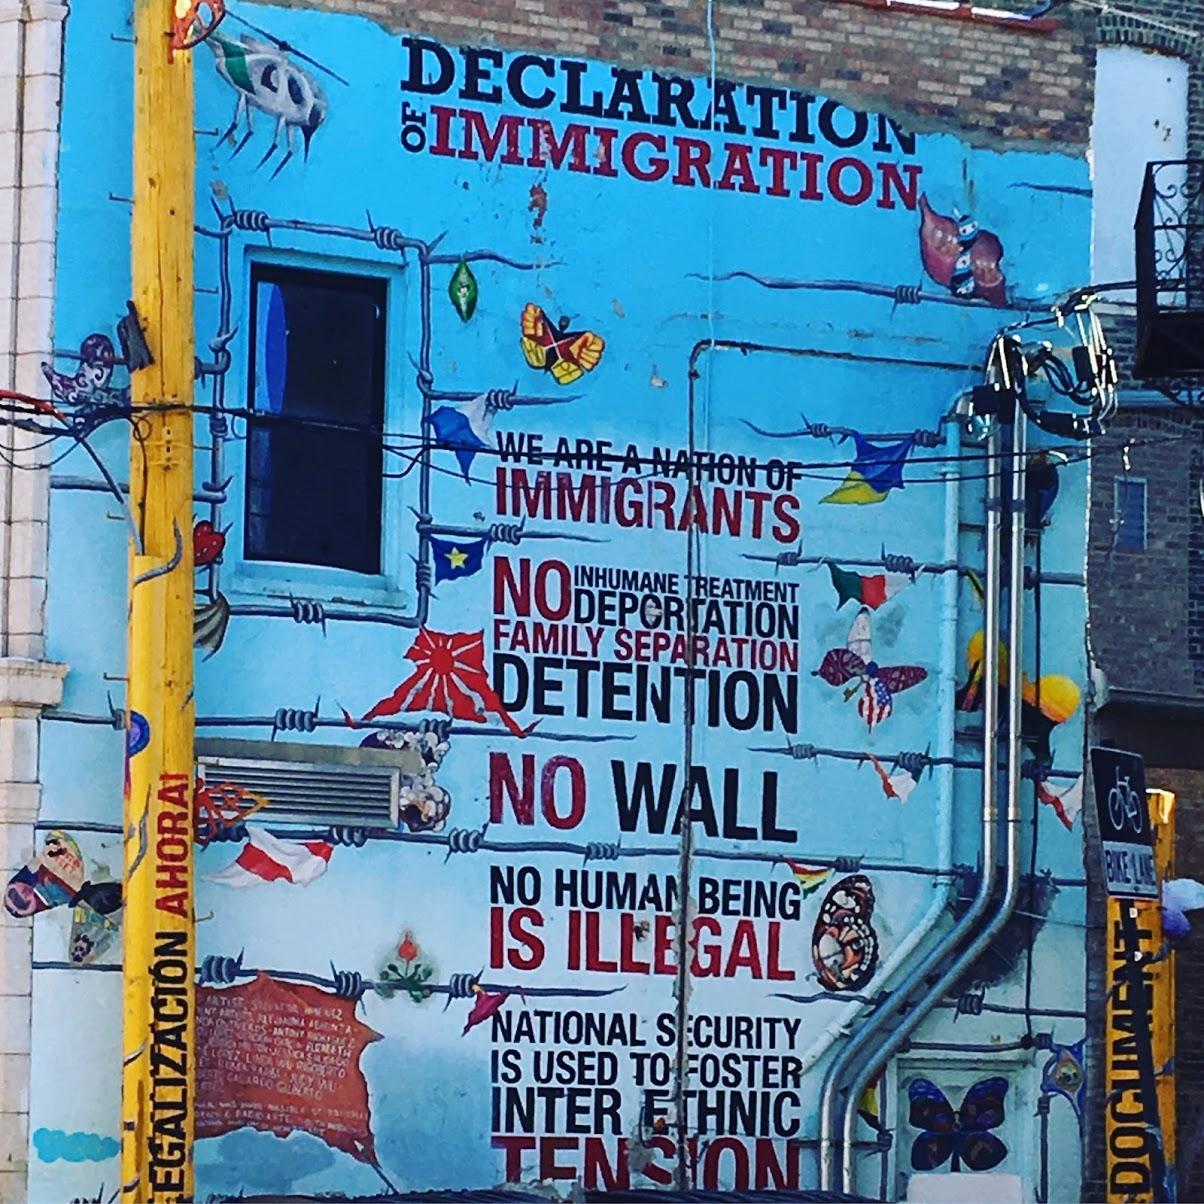 Pilsen Mural Declaration of Immigration - photo by Karen Jean Martinson